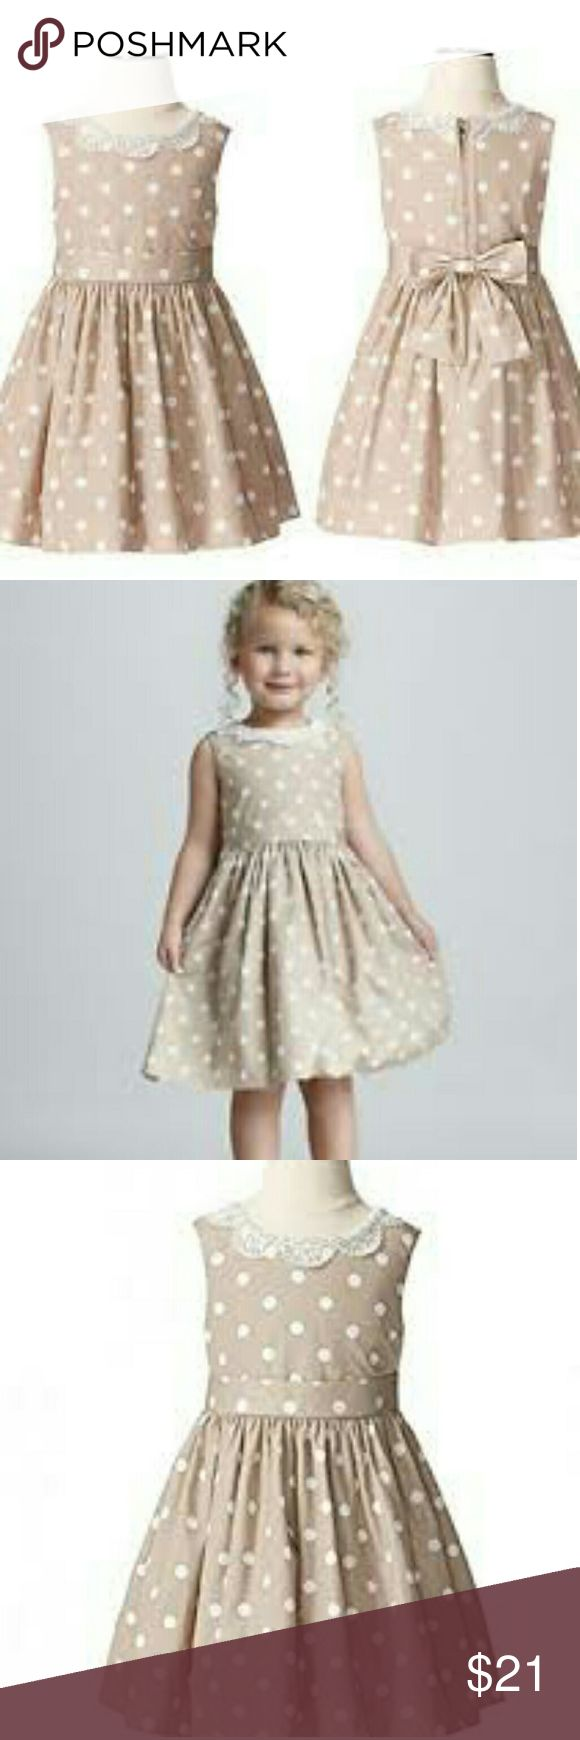 Jason wu polka dot dress Lace collar. Polka dots. Gorgeous dress. Zip up back with bow. Great worn condition. Jason Wu Dresses Formal